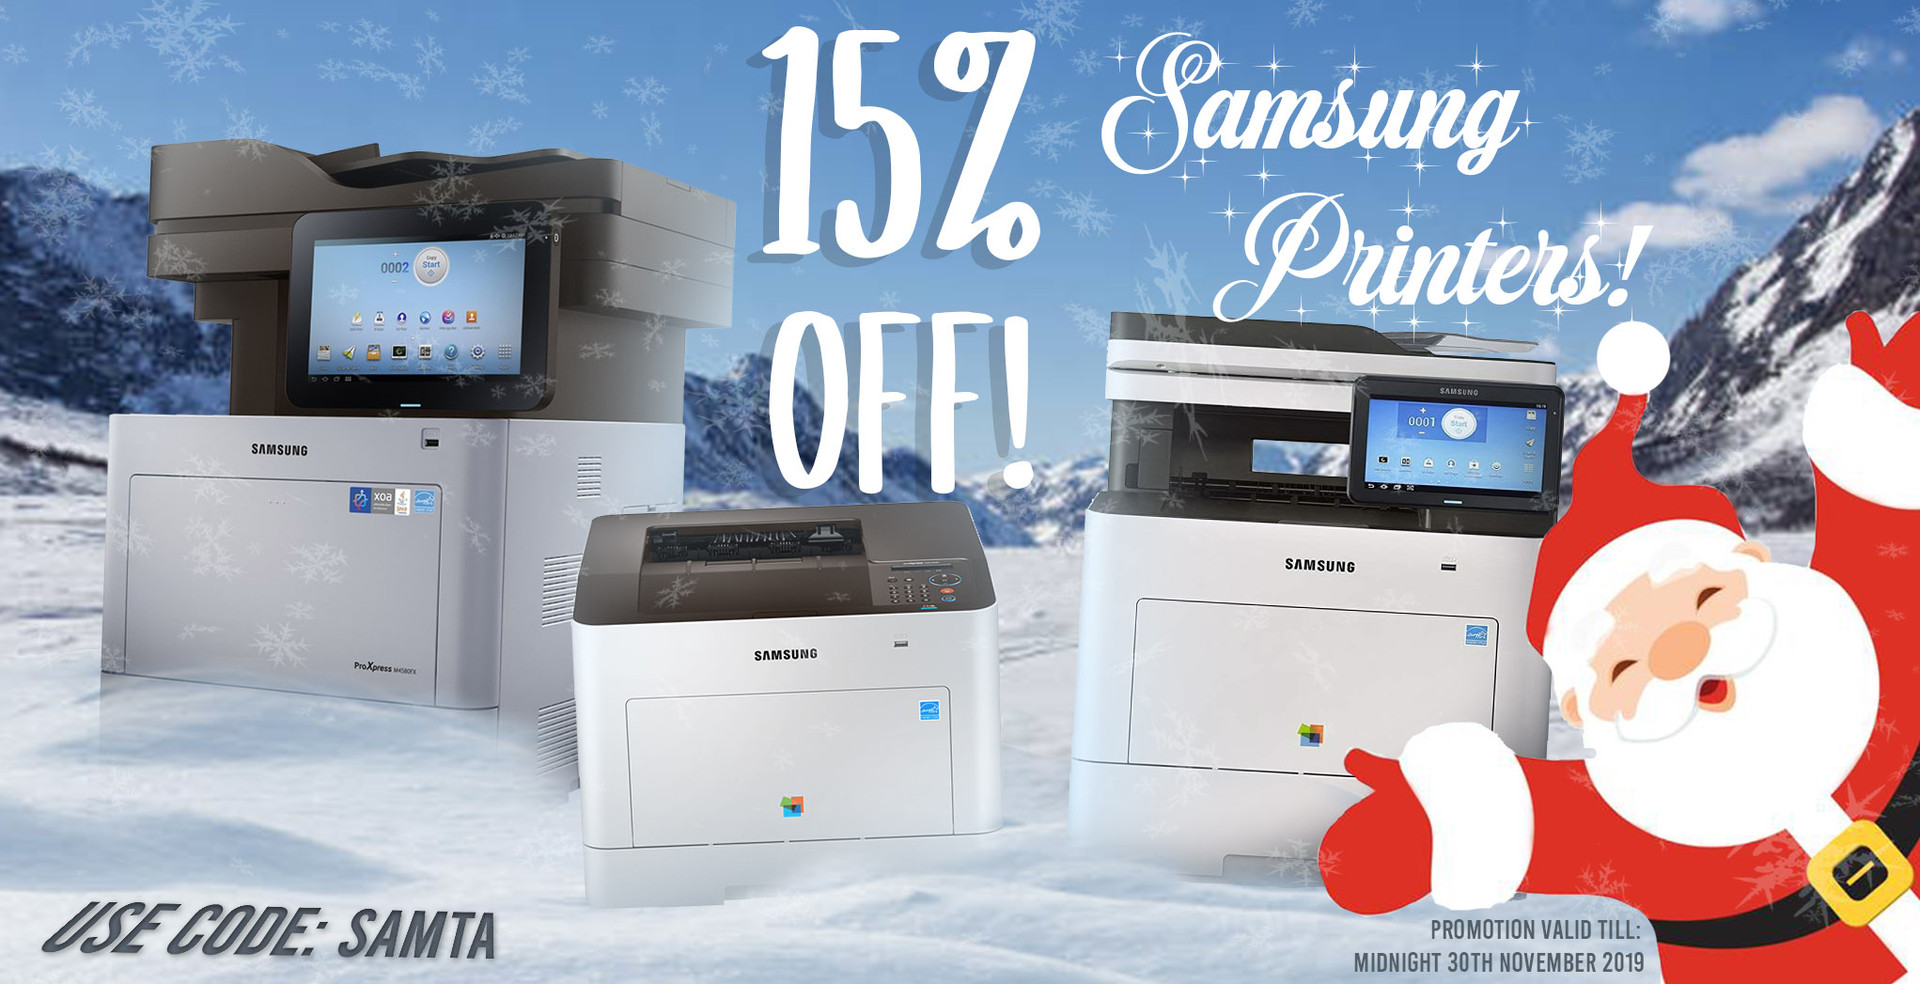 15% Off Samsung Printers using code SAMTA